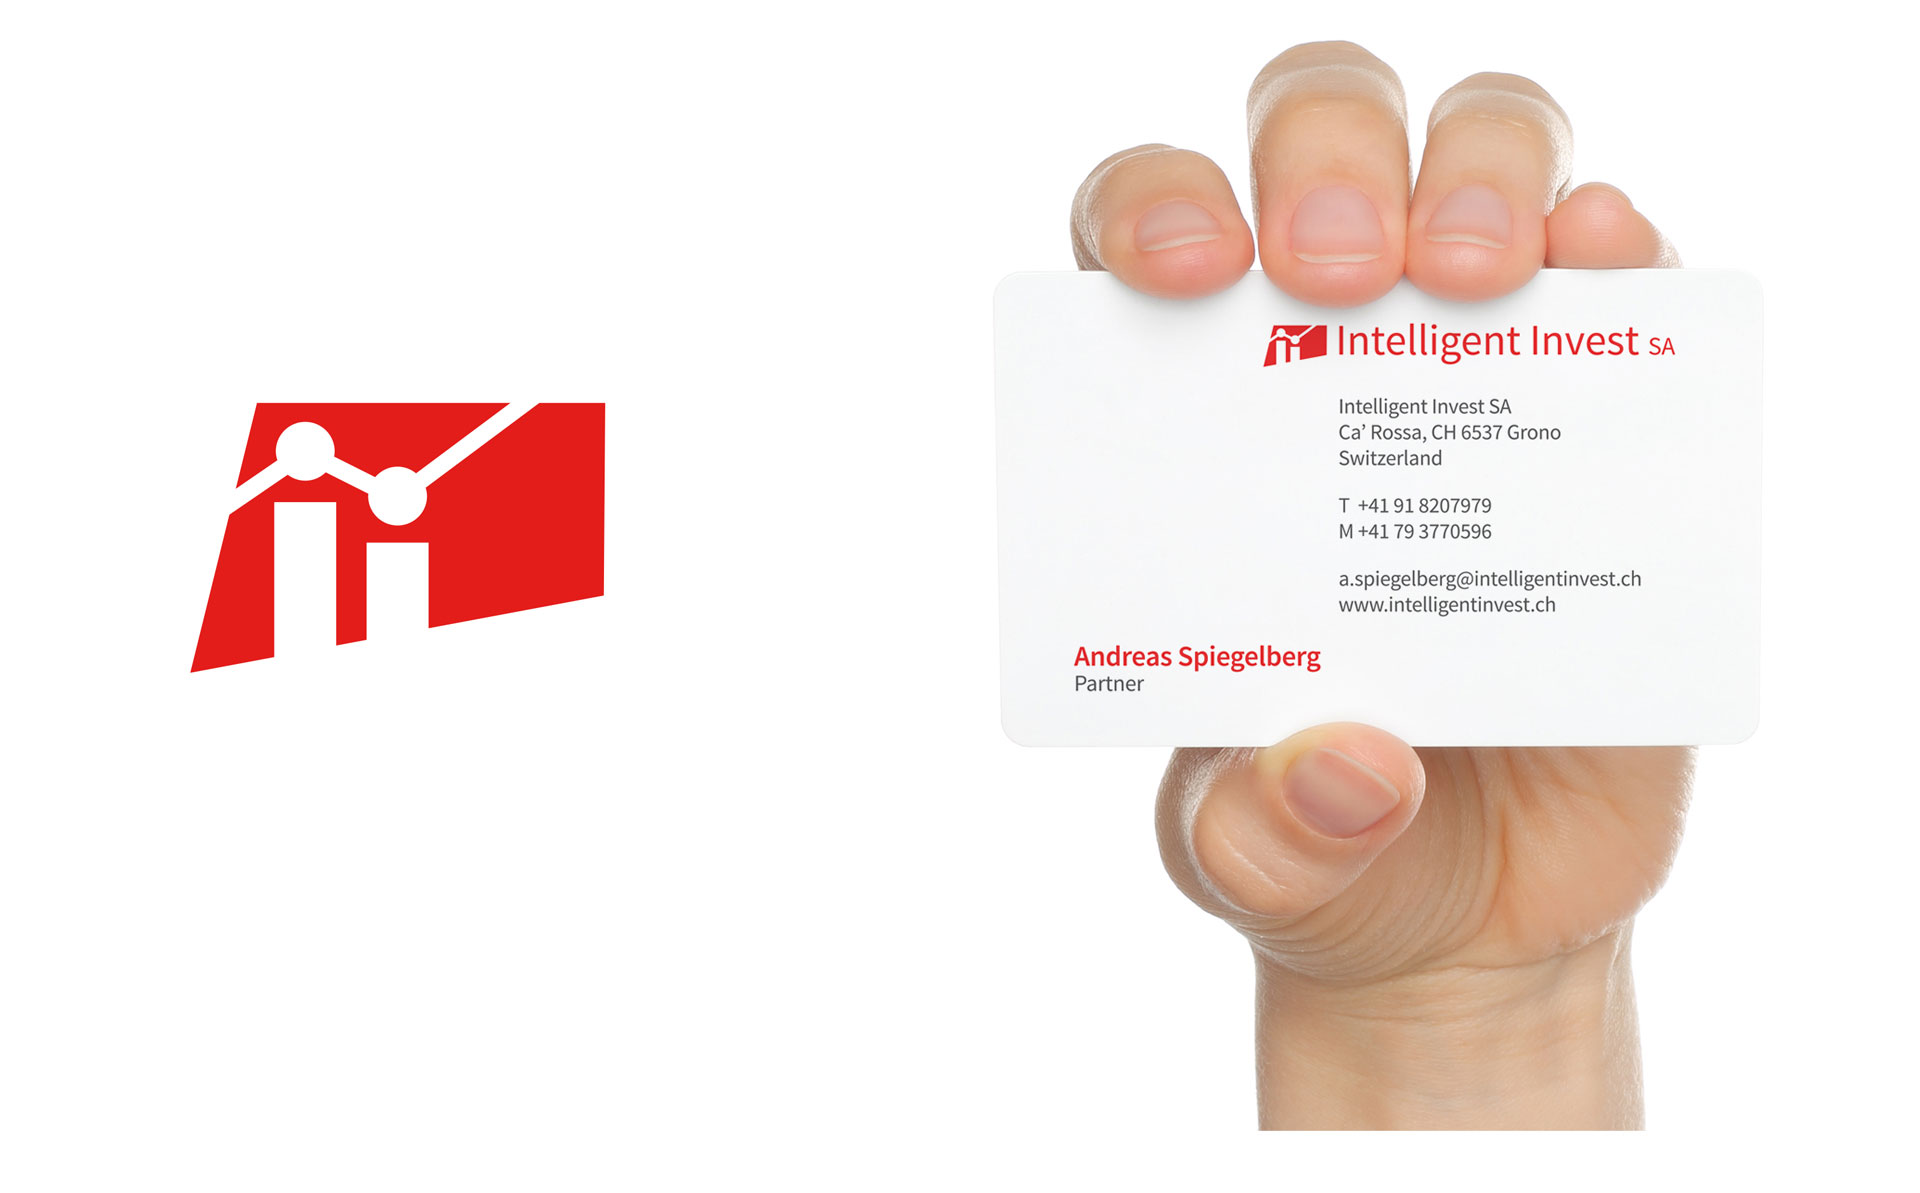 corporate identity - Business card design